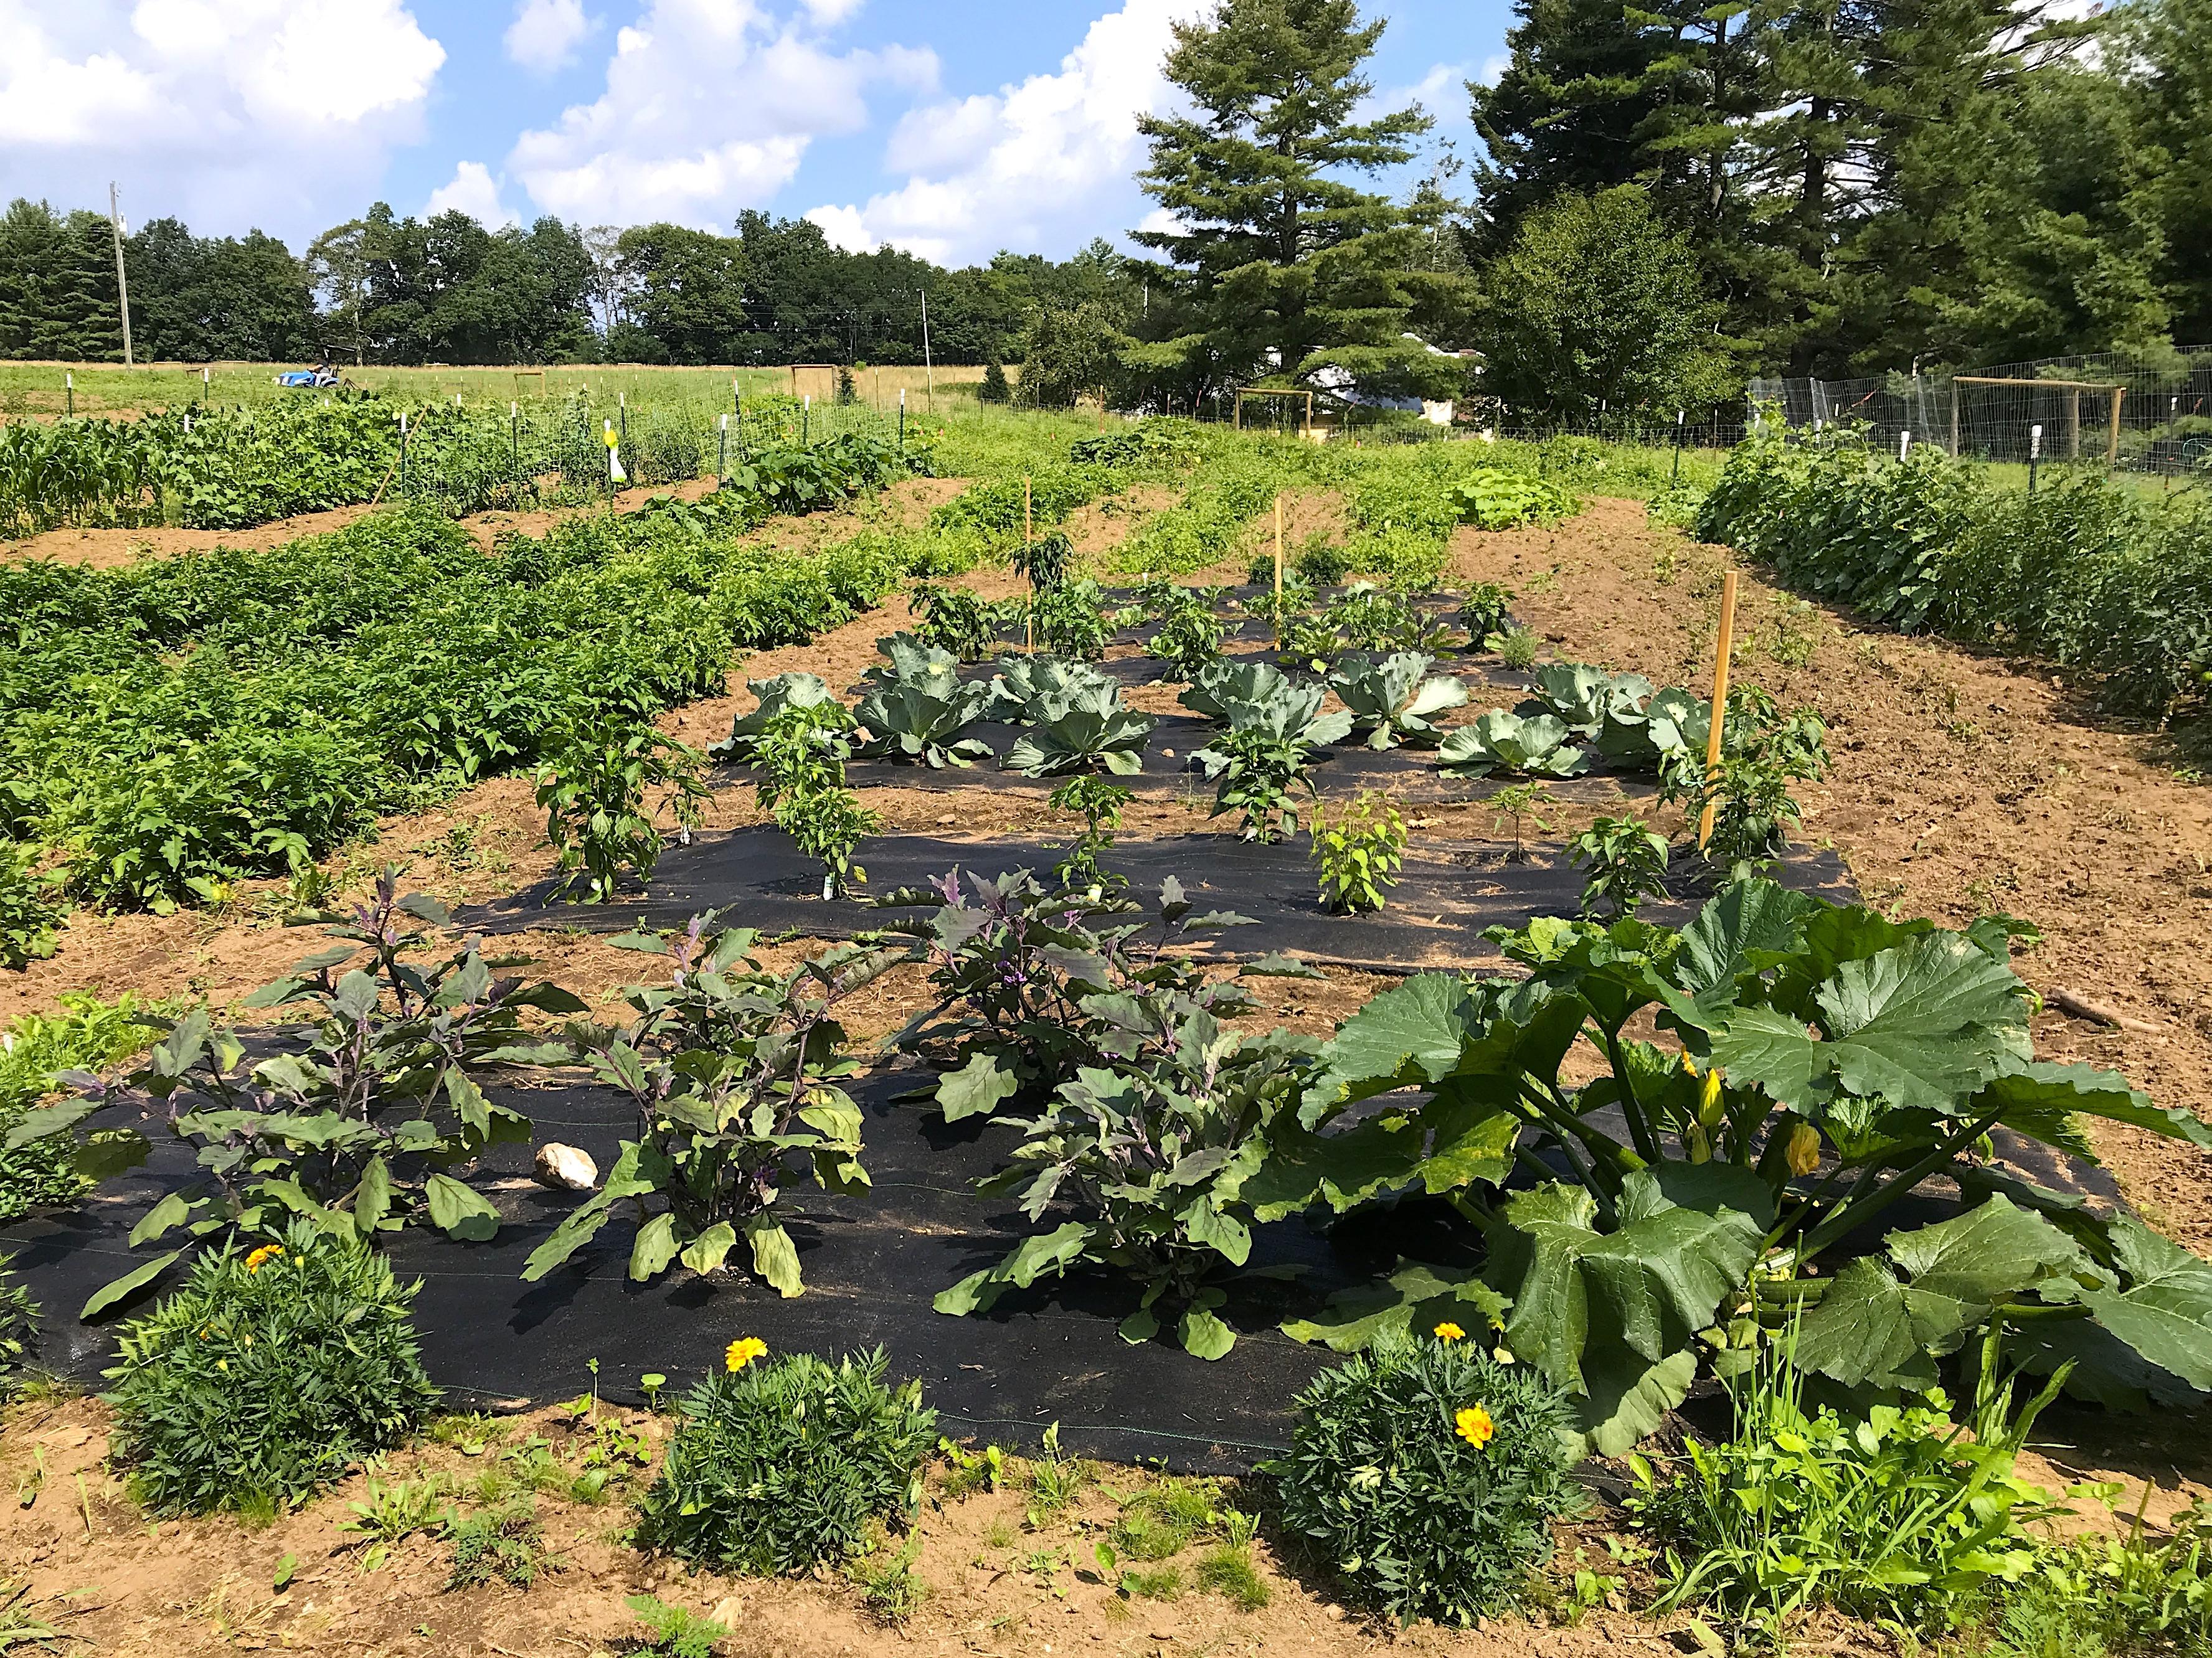 Summer garden at Sycamore Hill Farm